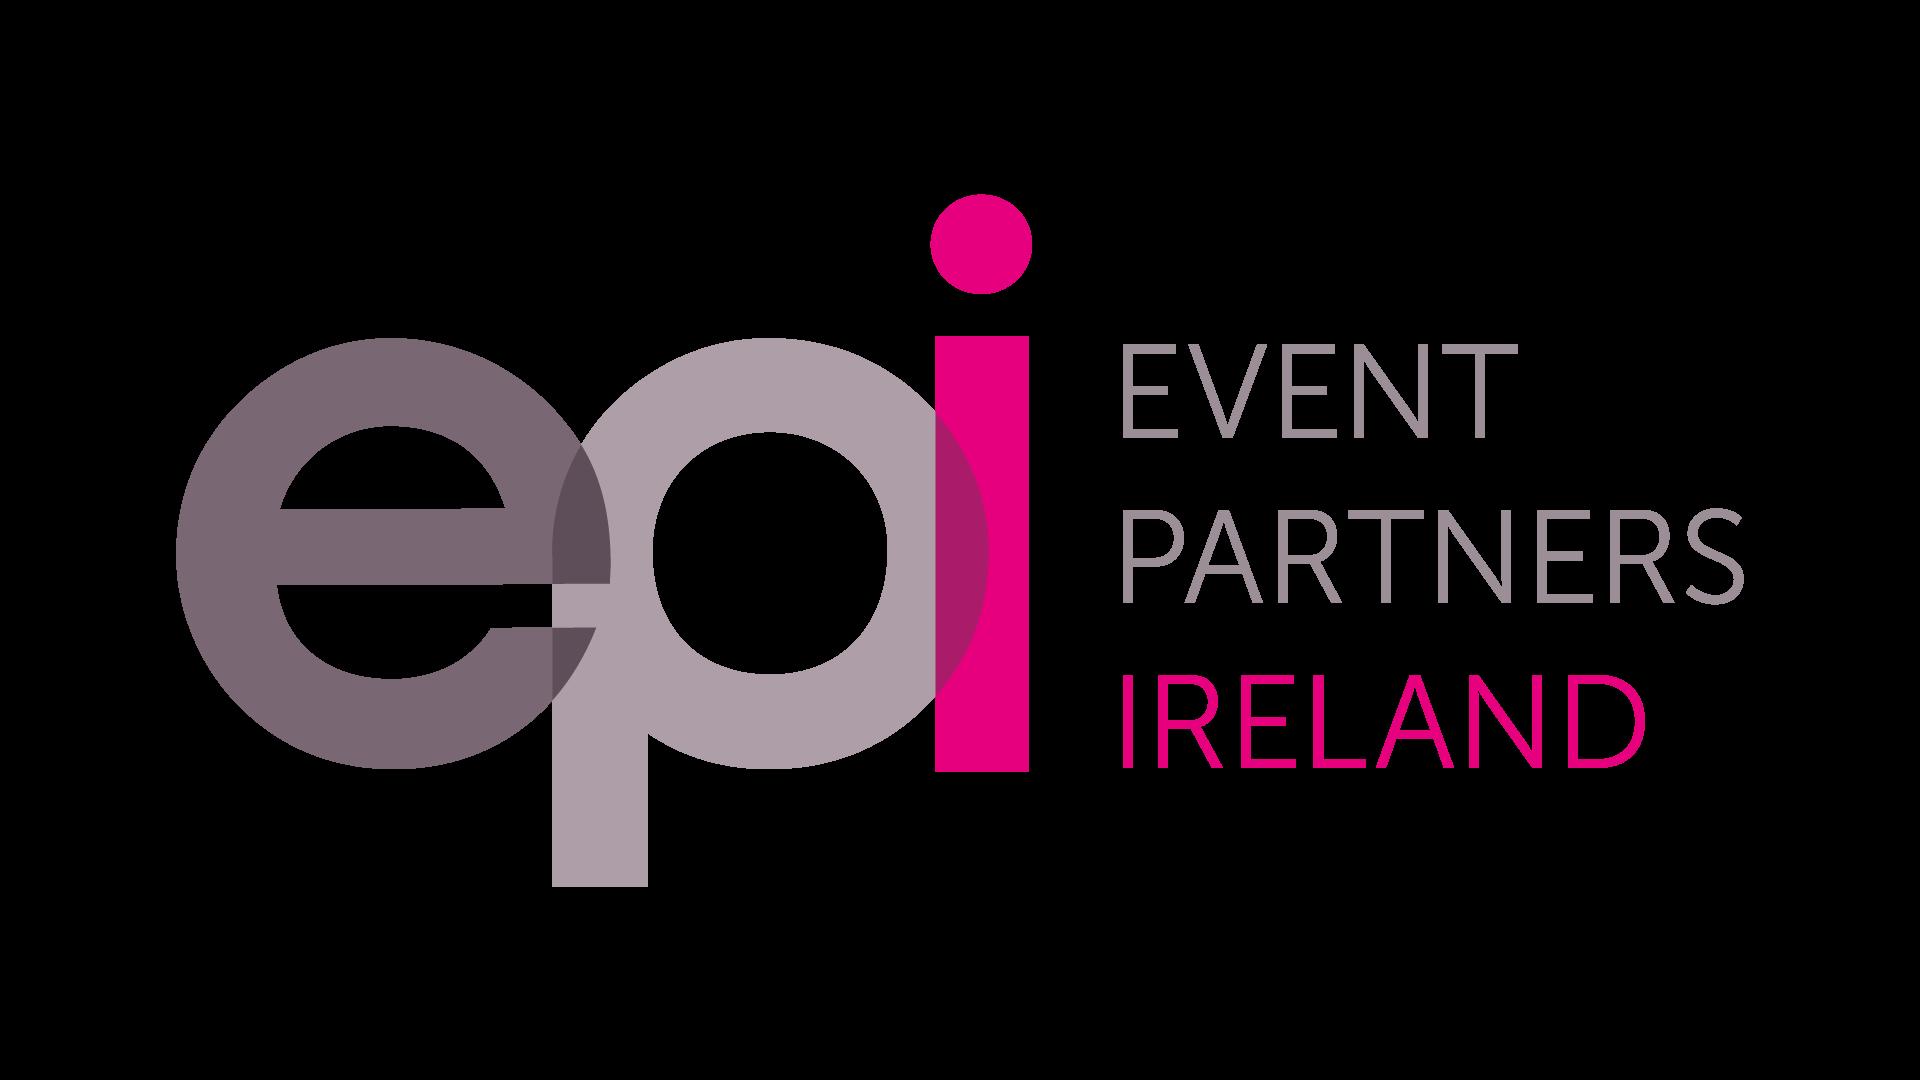 Event Partners Ireland